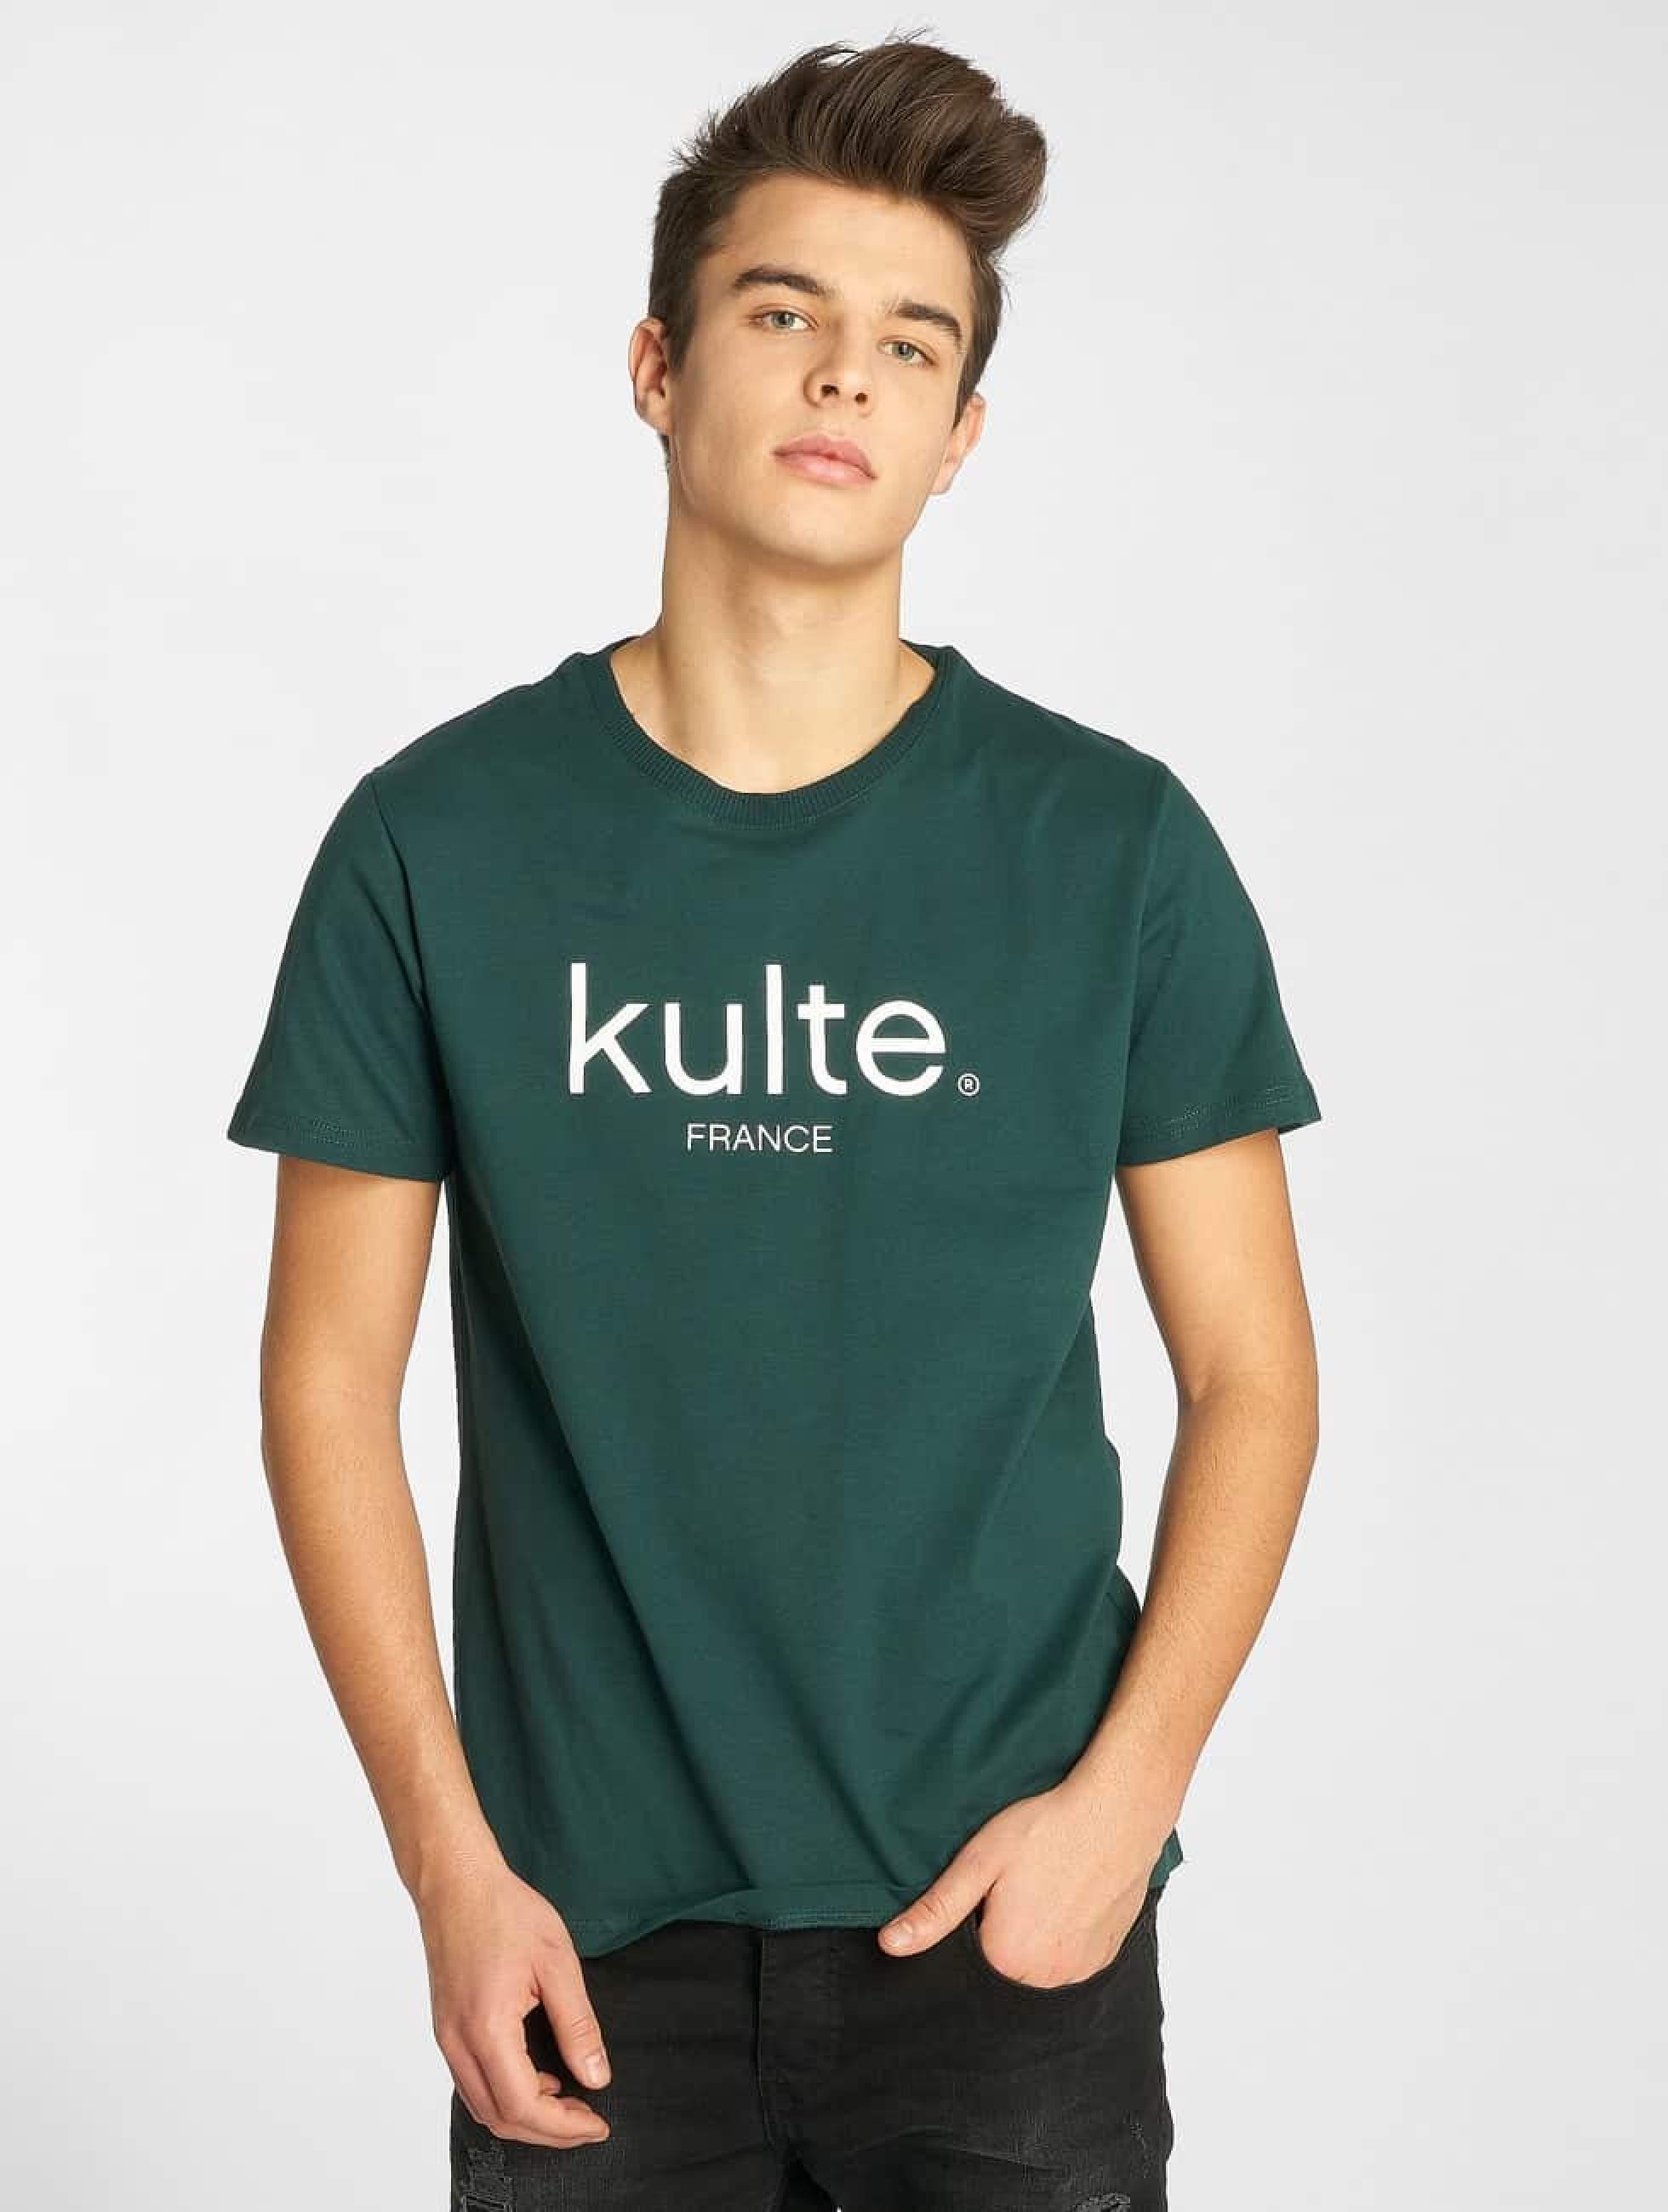 Kulte   Corpo vert Homme T-Shirt